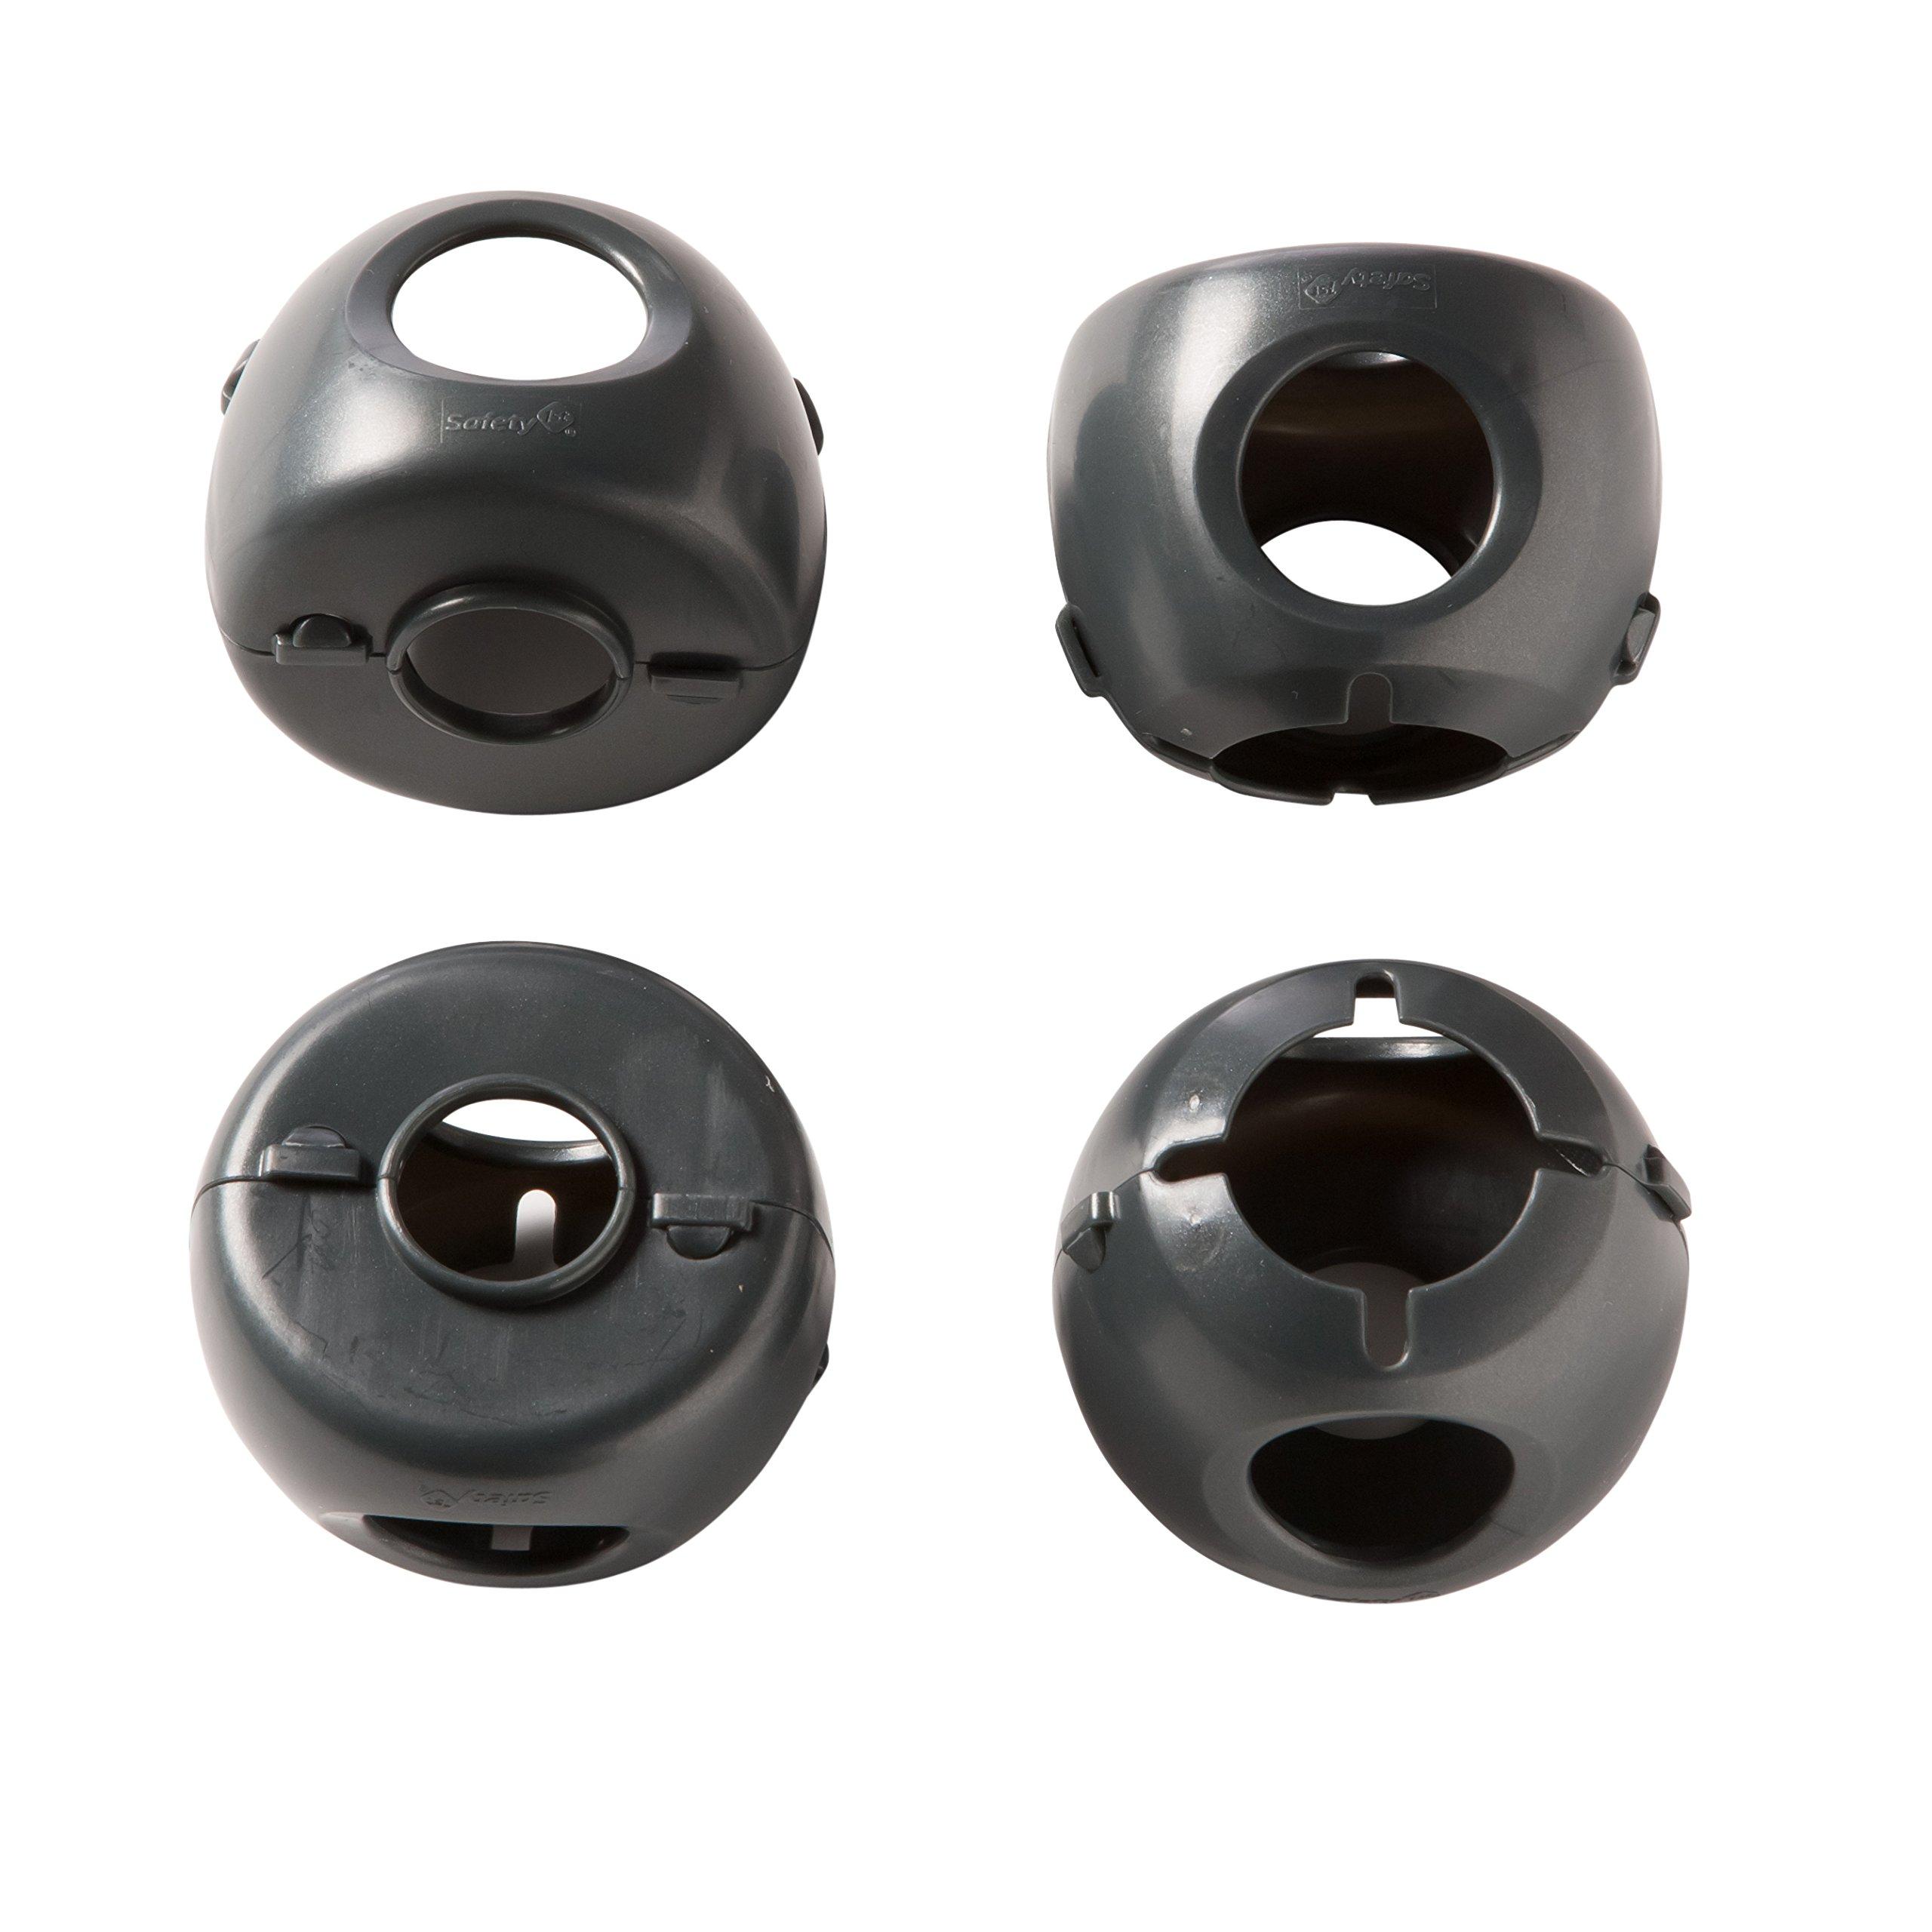 Safety 1st Grip N' Twist Door Knob Covers Decor, 4-Count